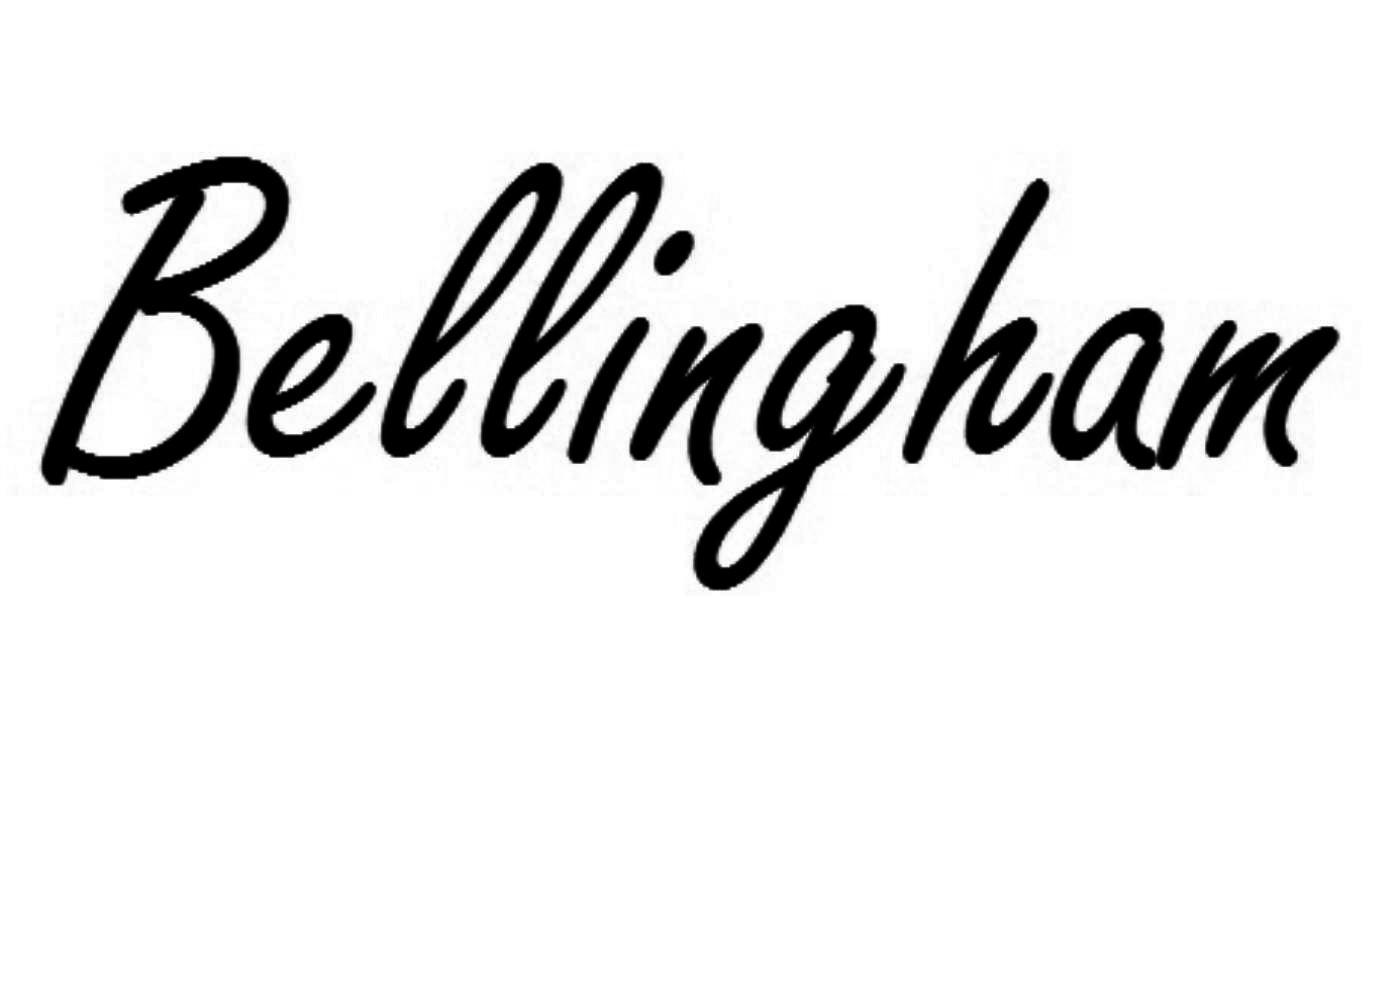 转让商标-BELLINGHAM